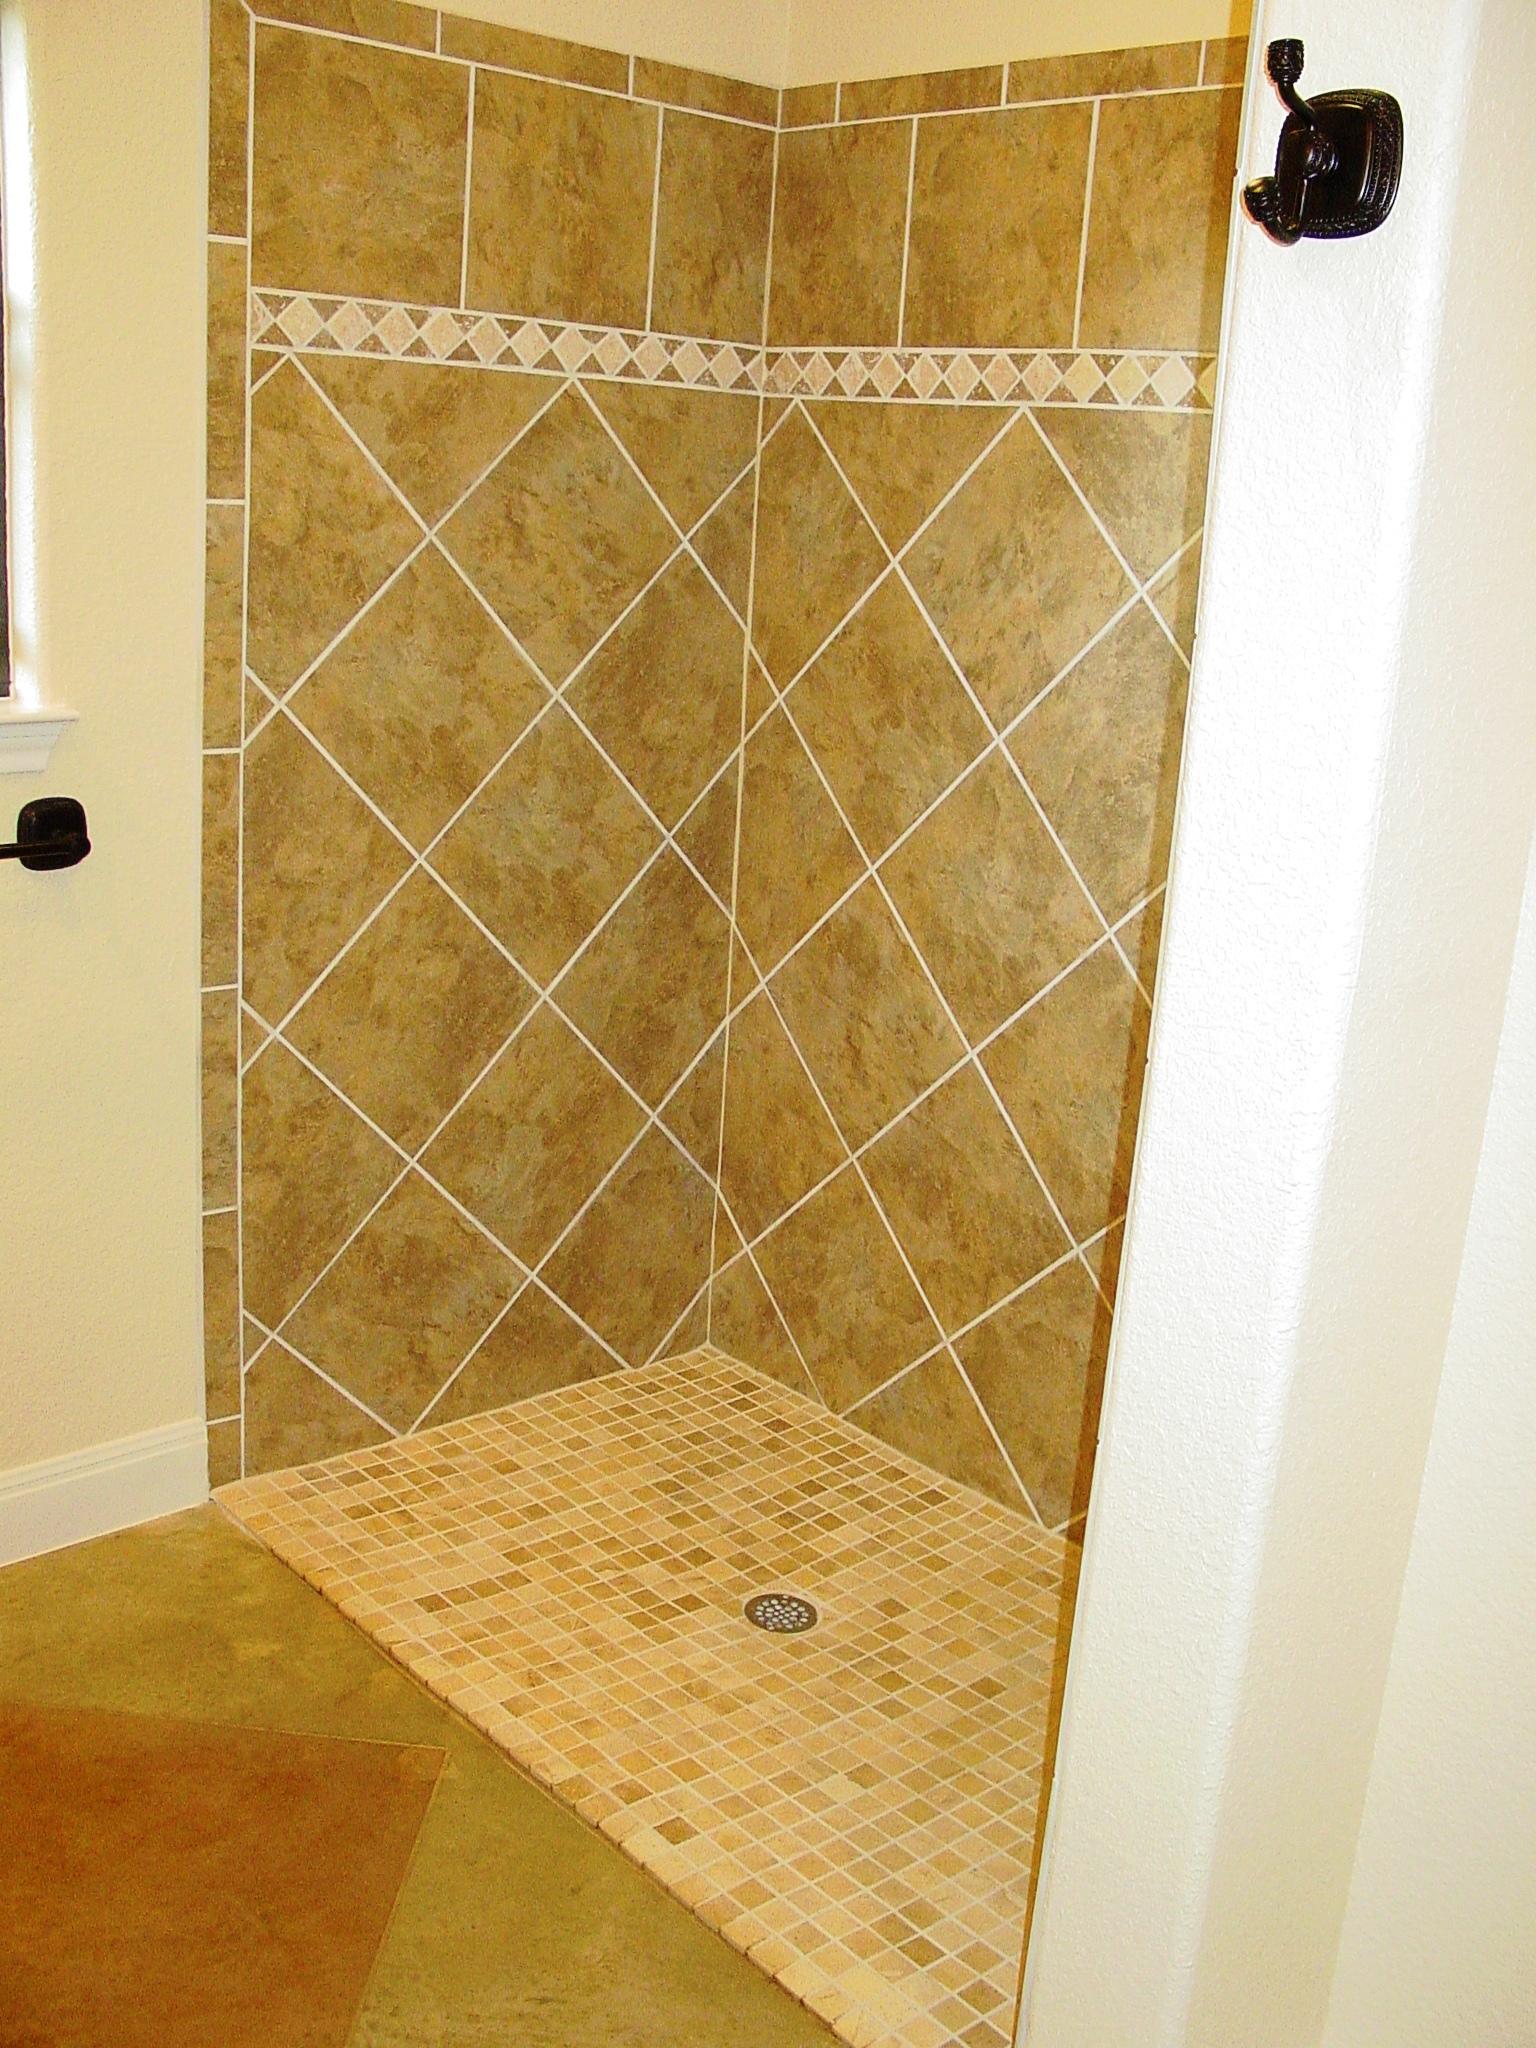 411 HH - Complete, Interior, Bath 1,2.JPG